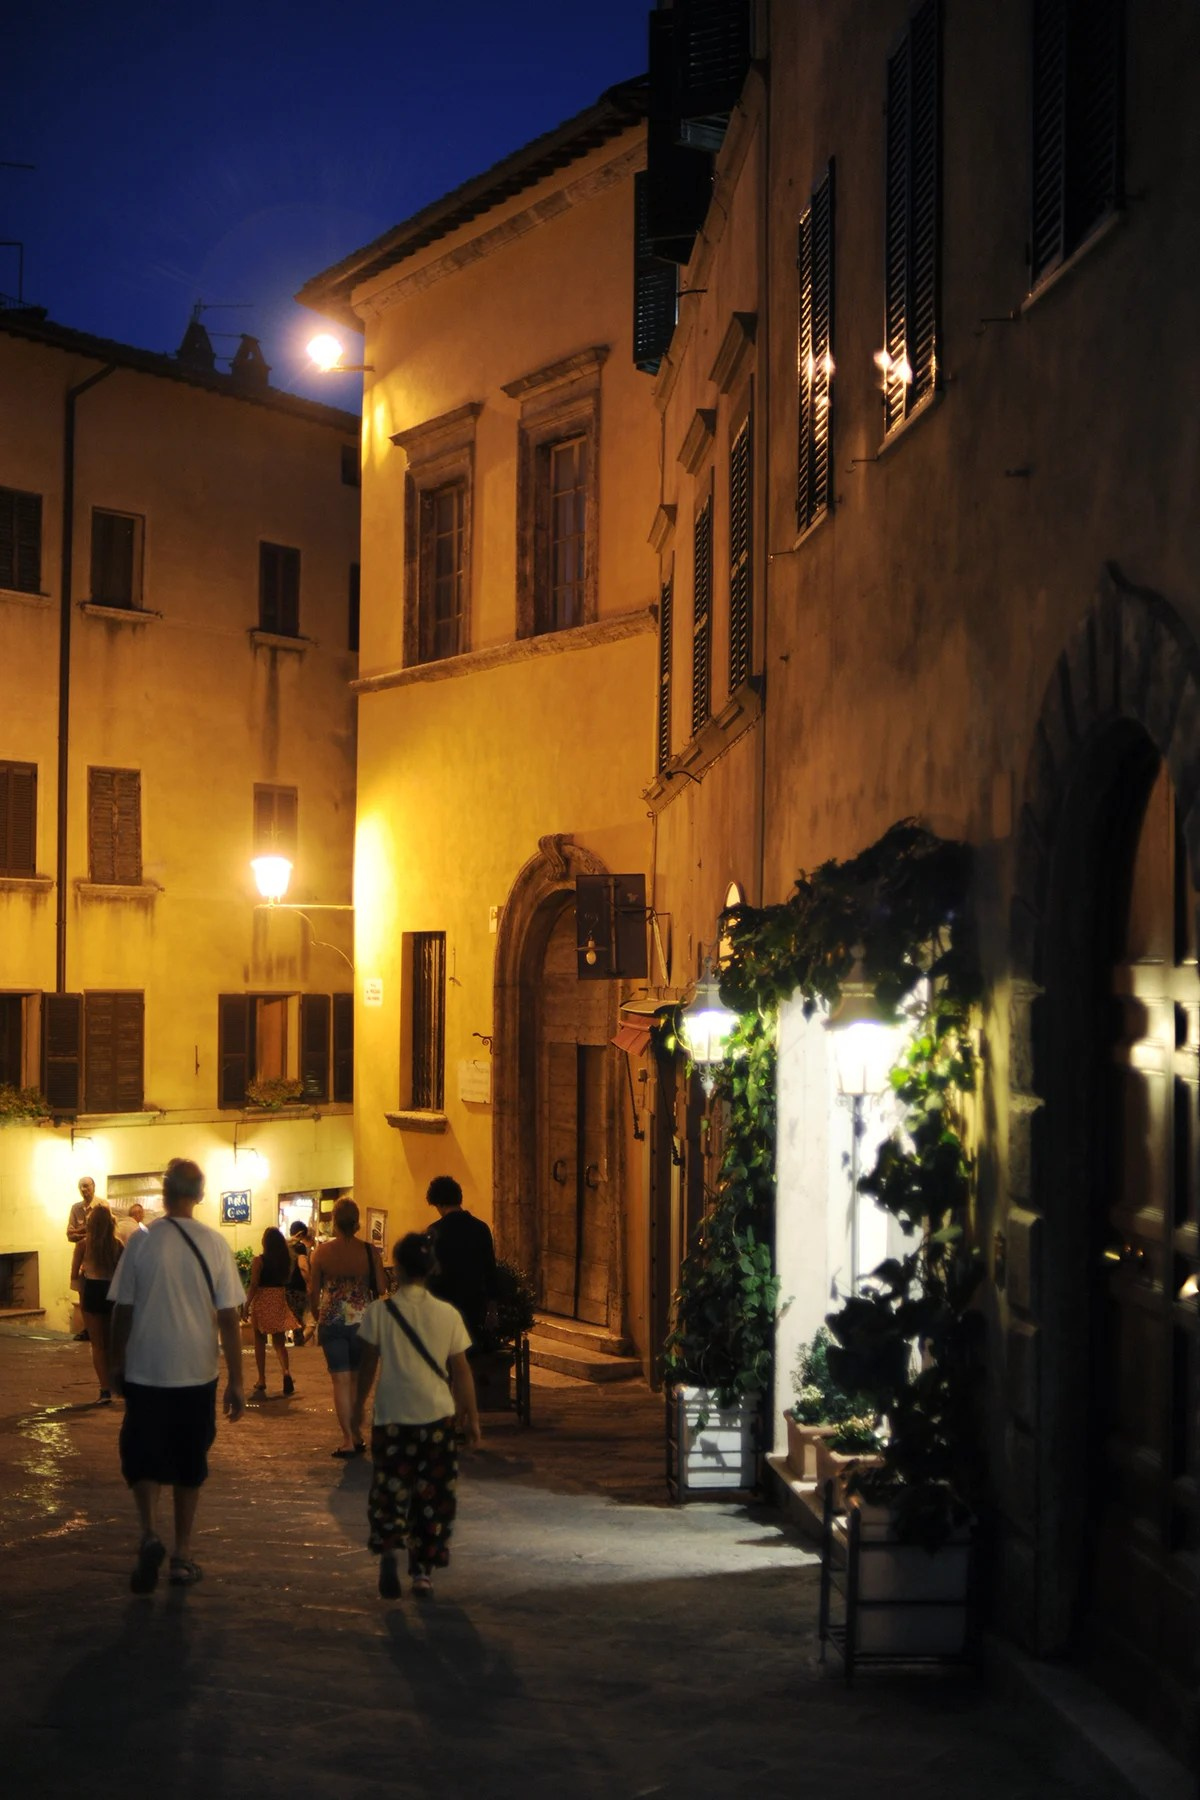 montepulciano italy tuscany villages